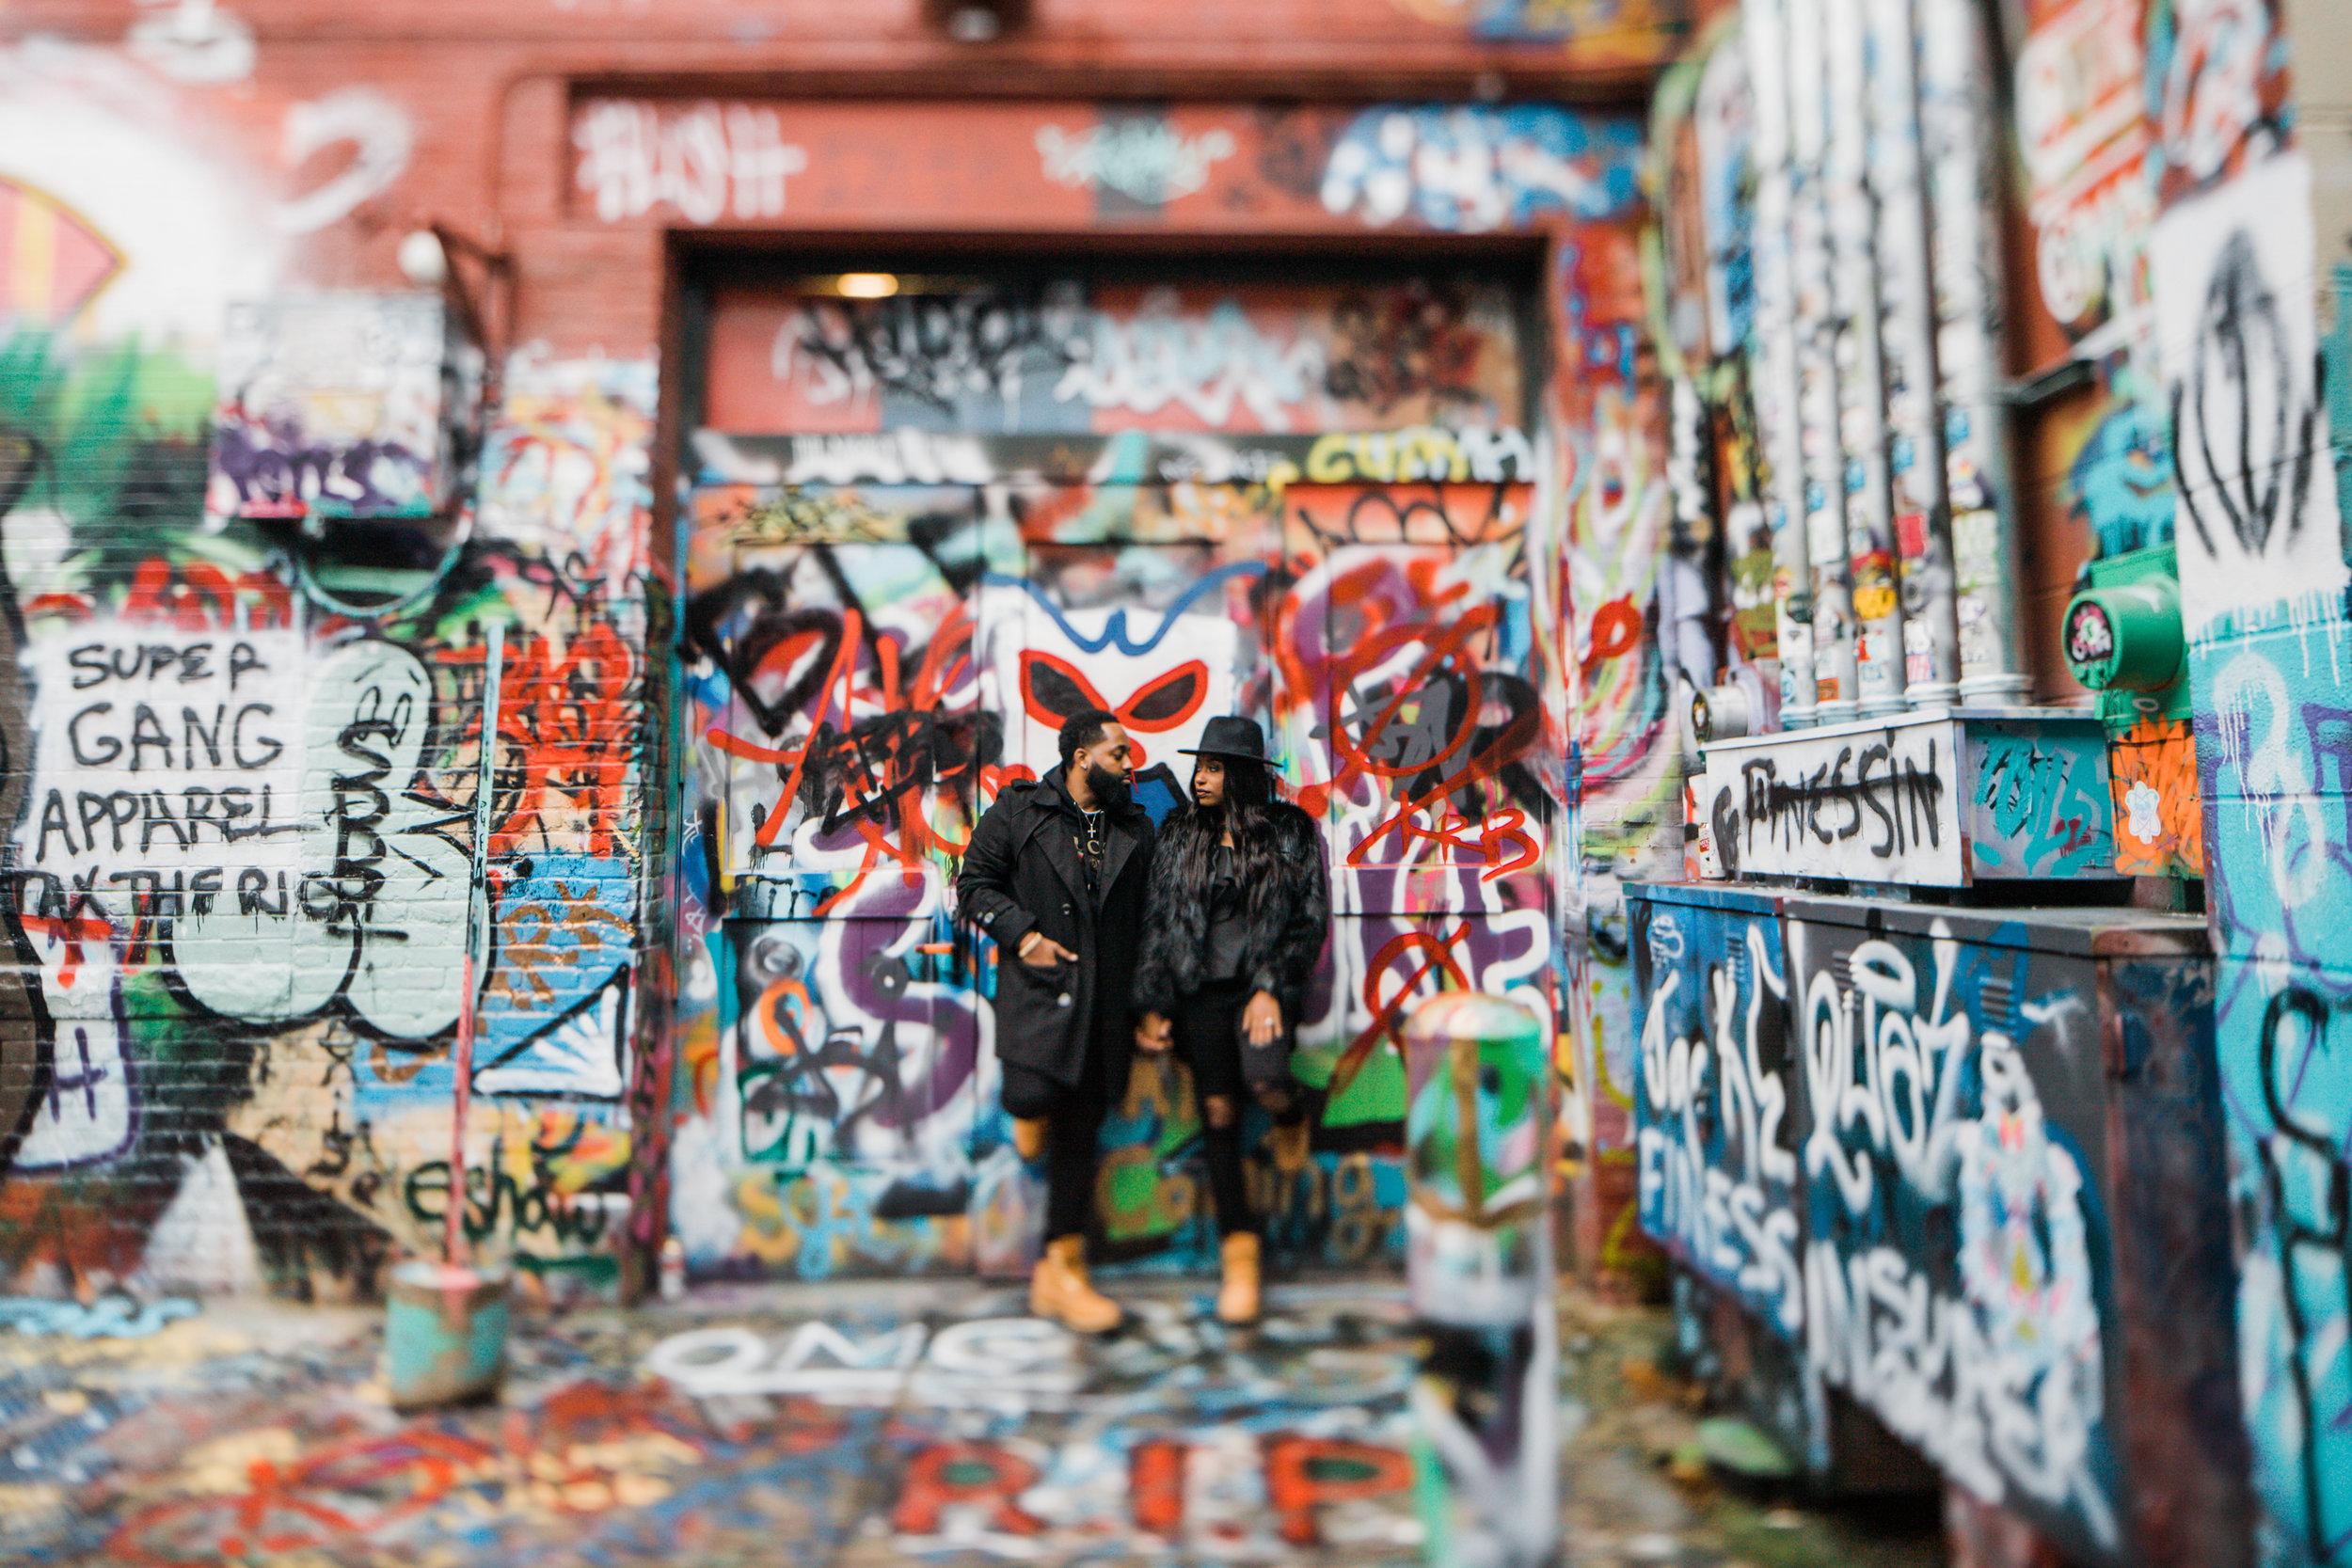 Creative Baltimore Graffiti Alley Engagement Session Megapixels Media Photography-17.jpg